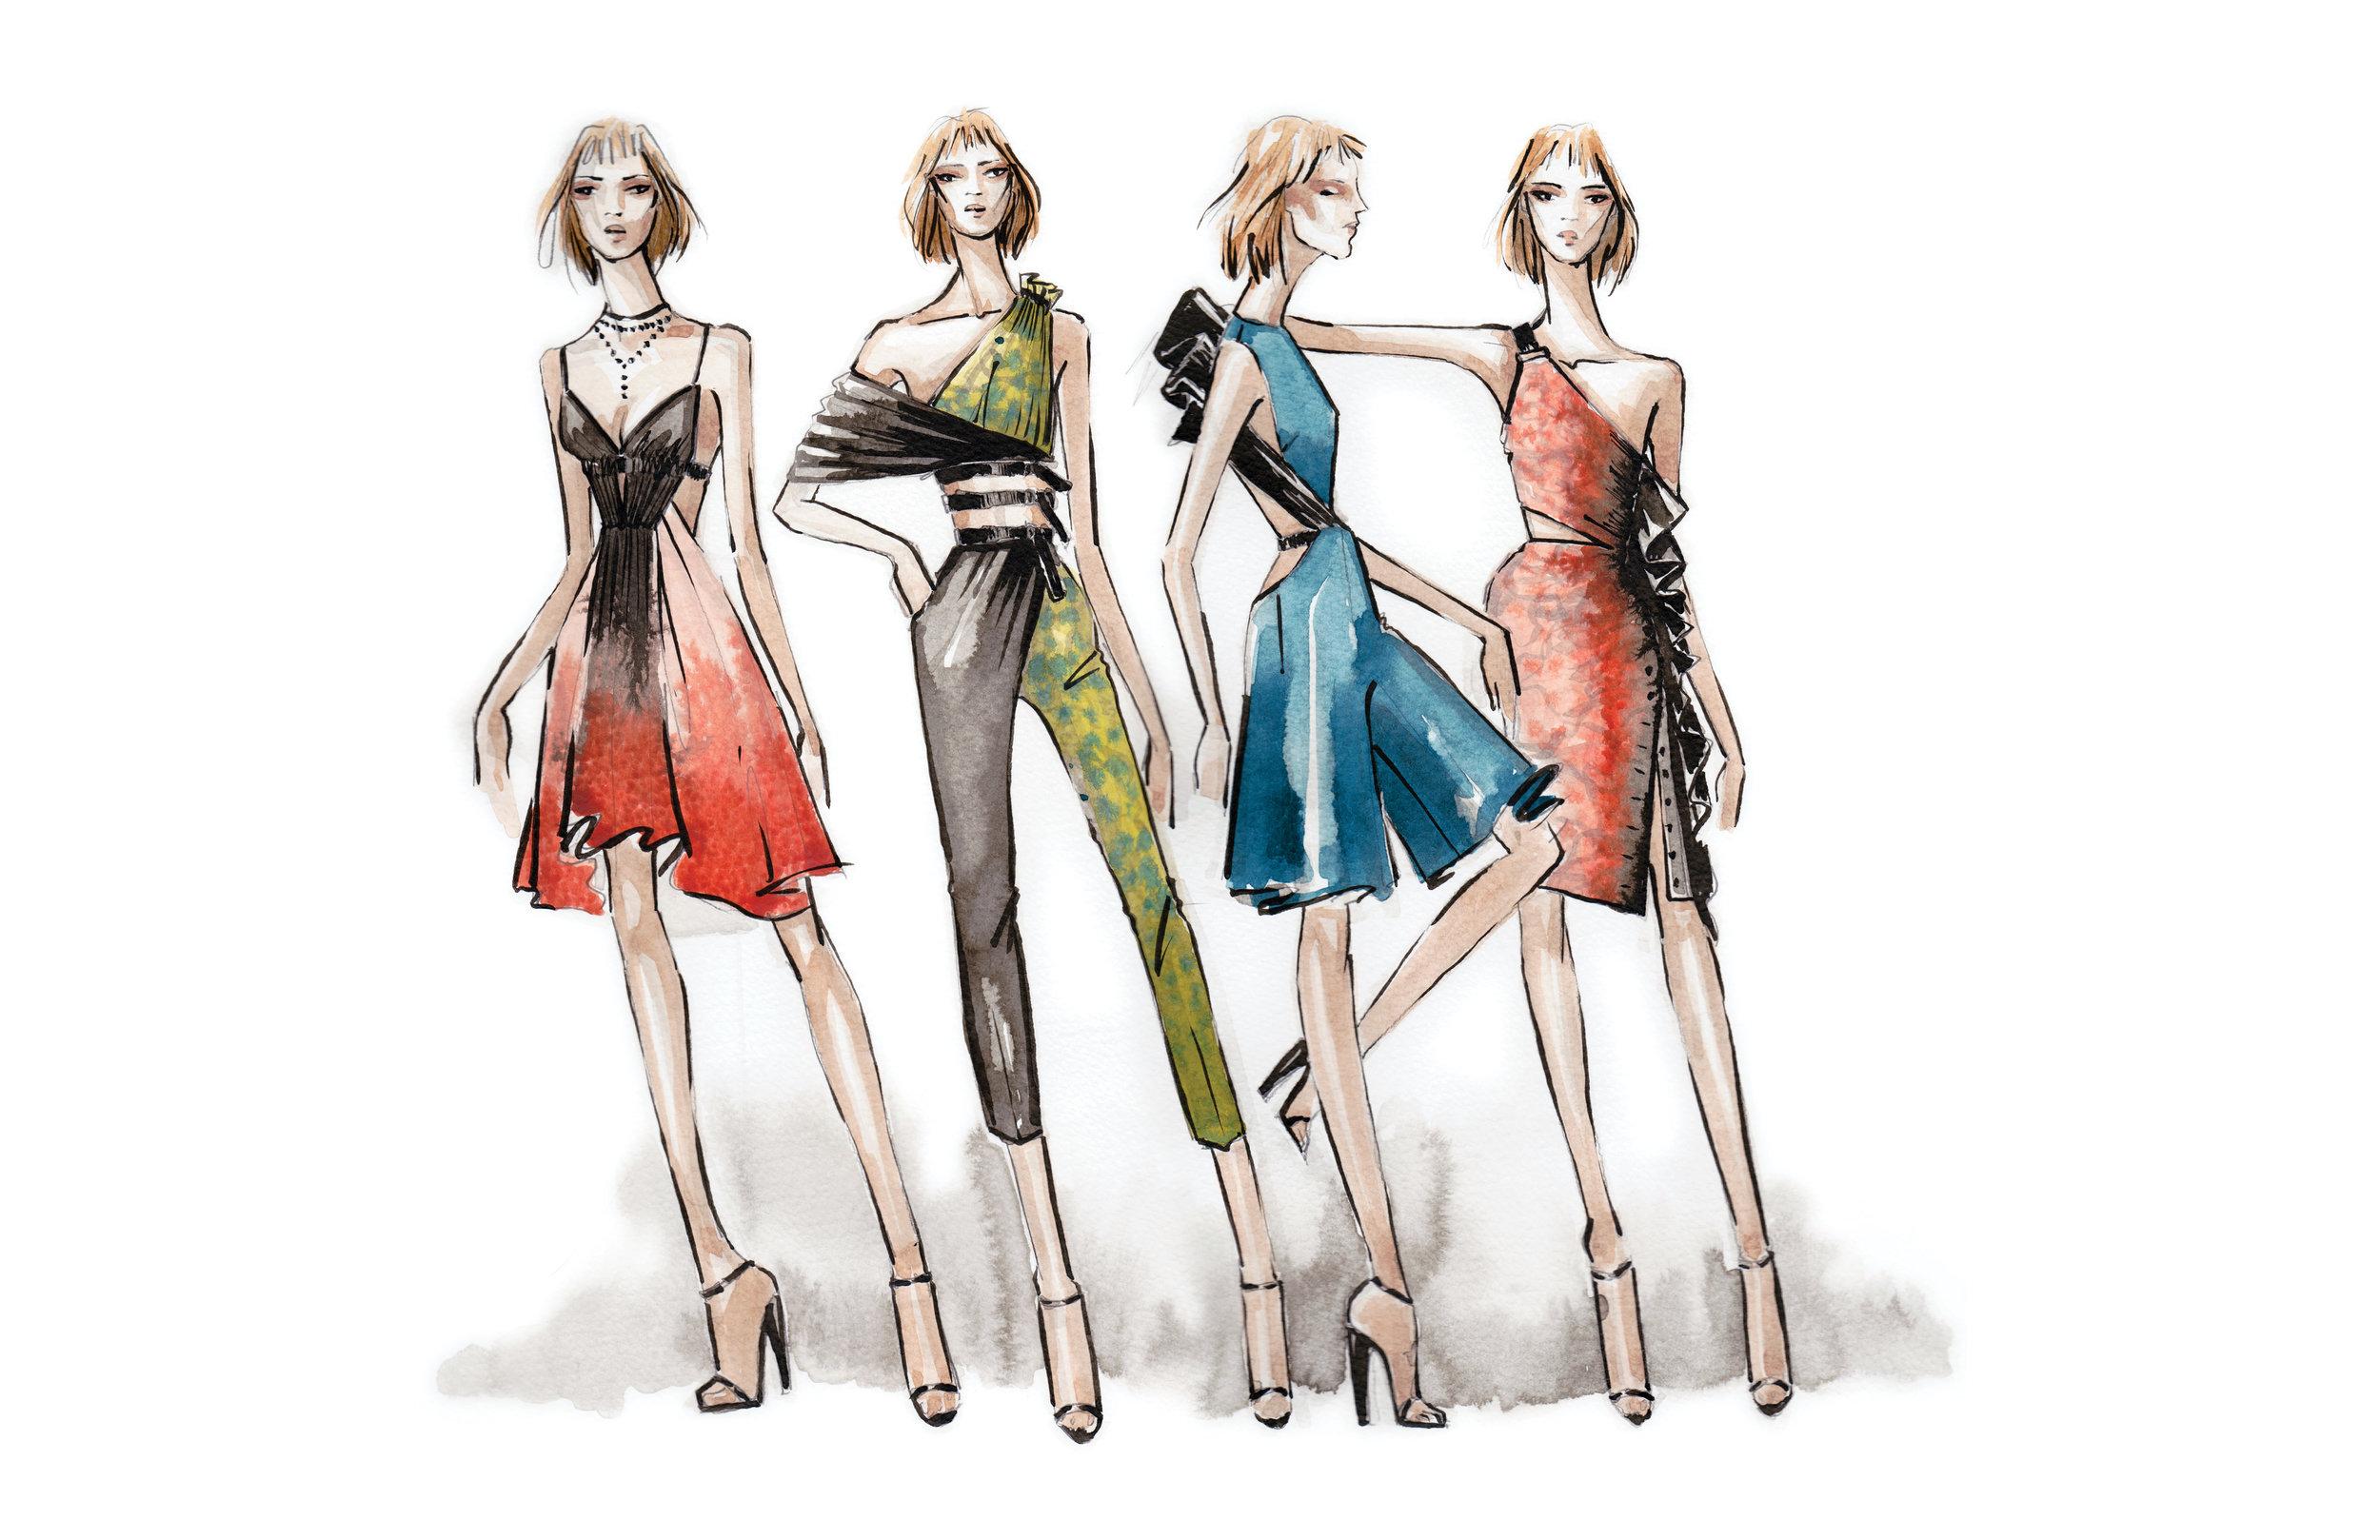 FREE PEOPLE DRESSES by DAVID FERRON13.jpg